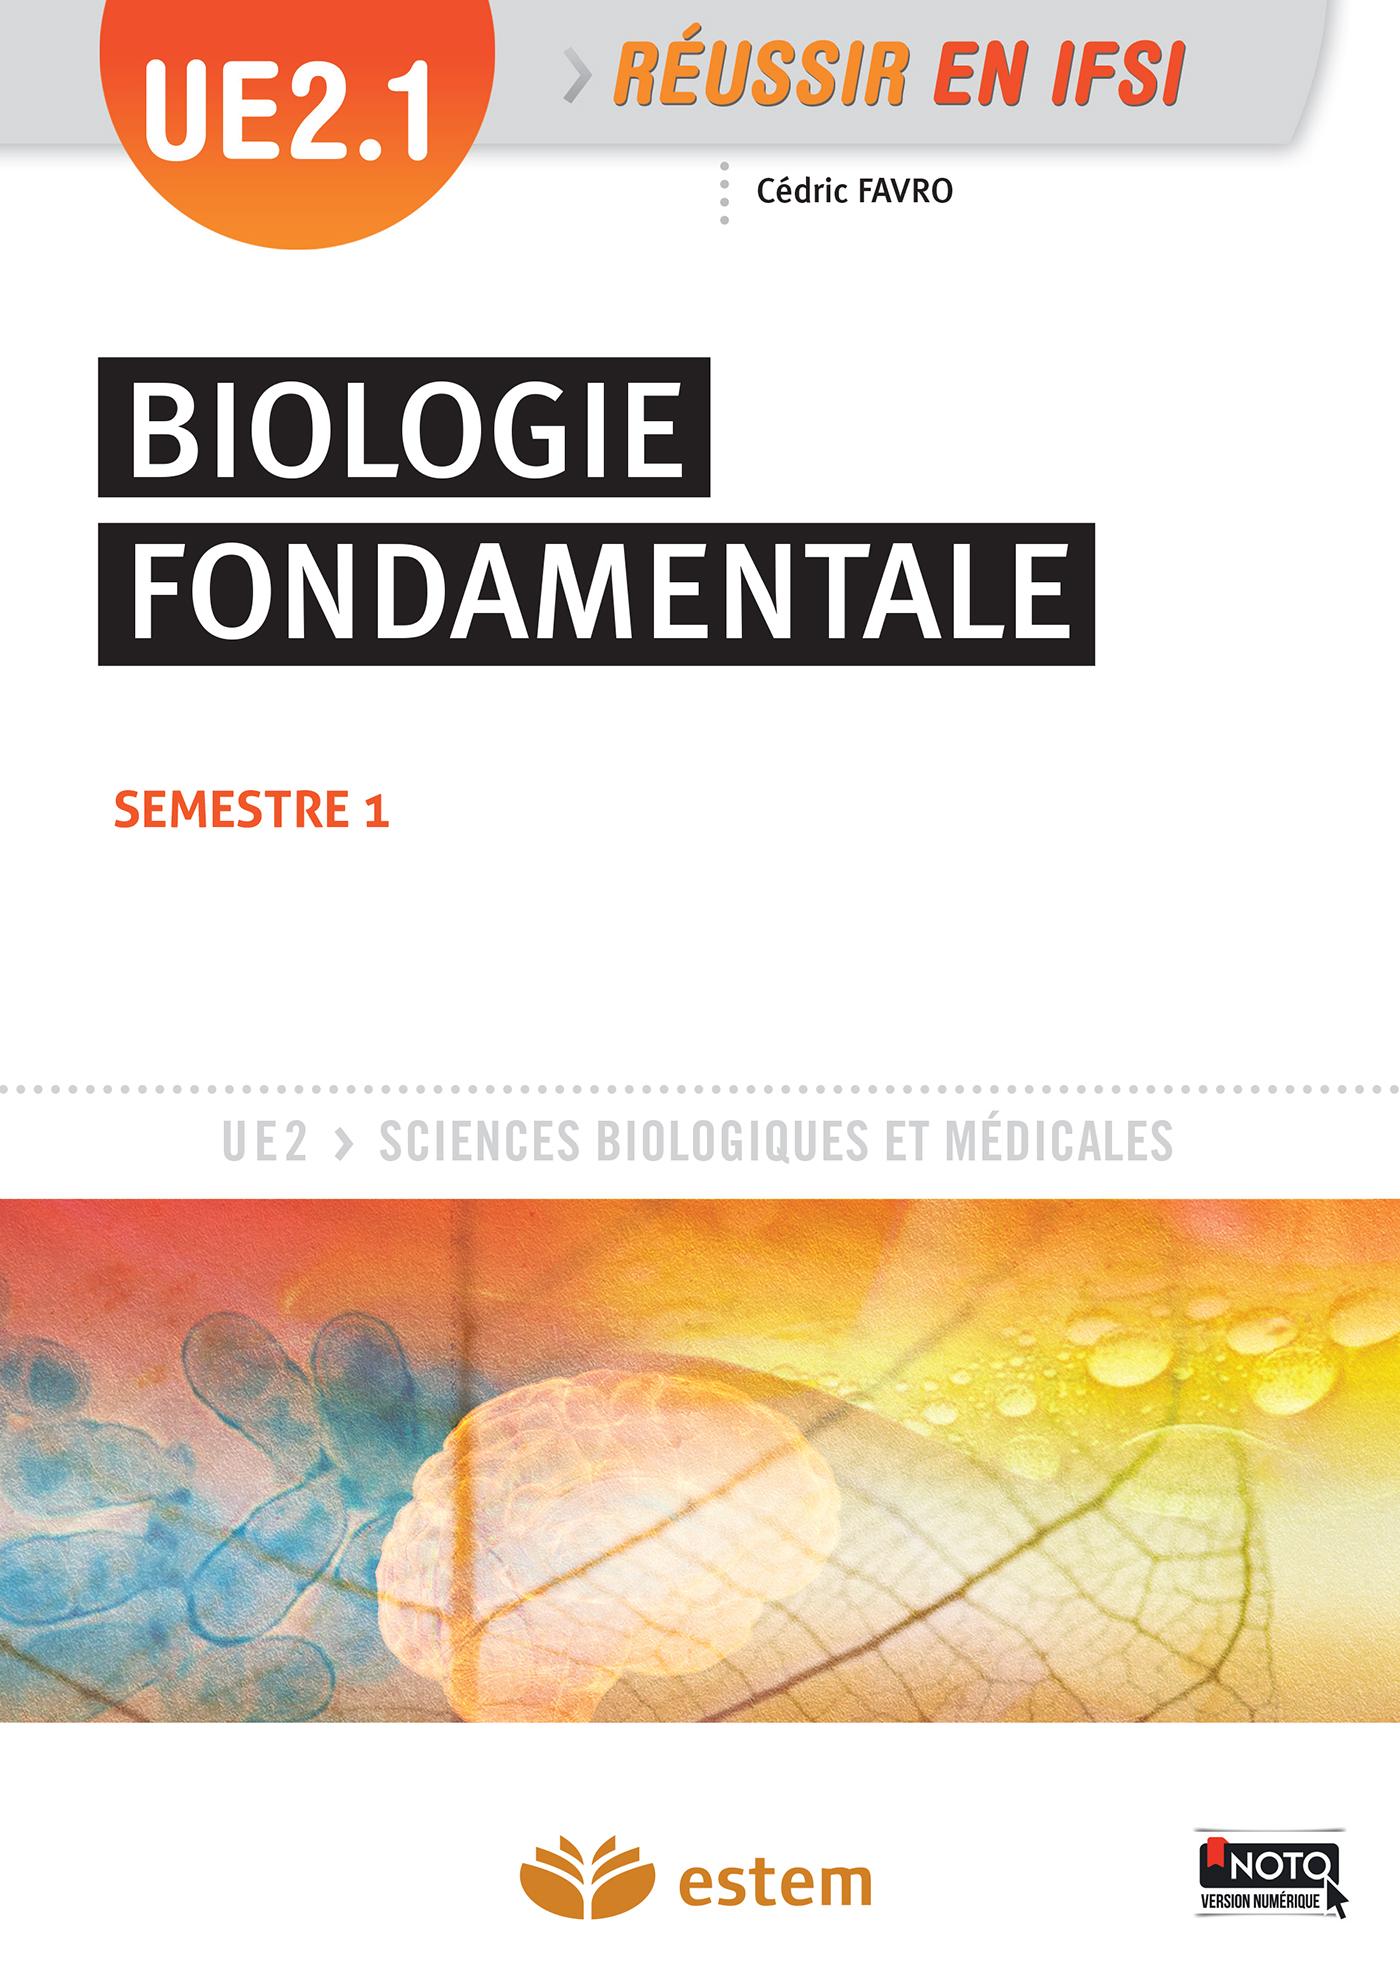 UE 2.1 BIOLOGIE FONDAMENTALE